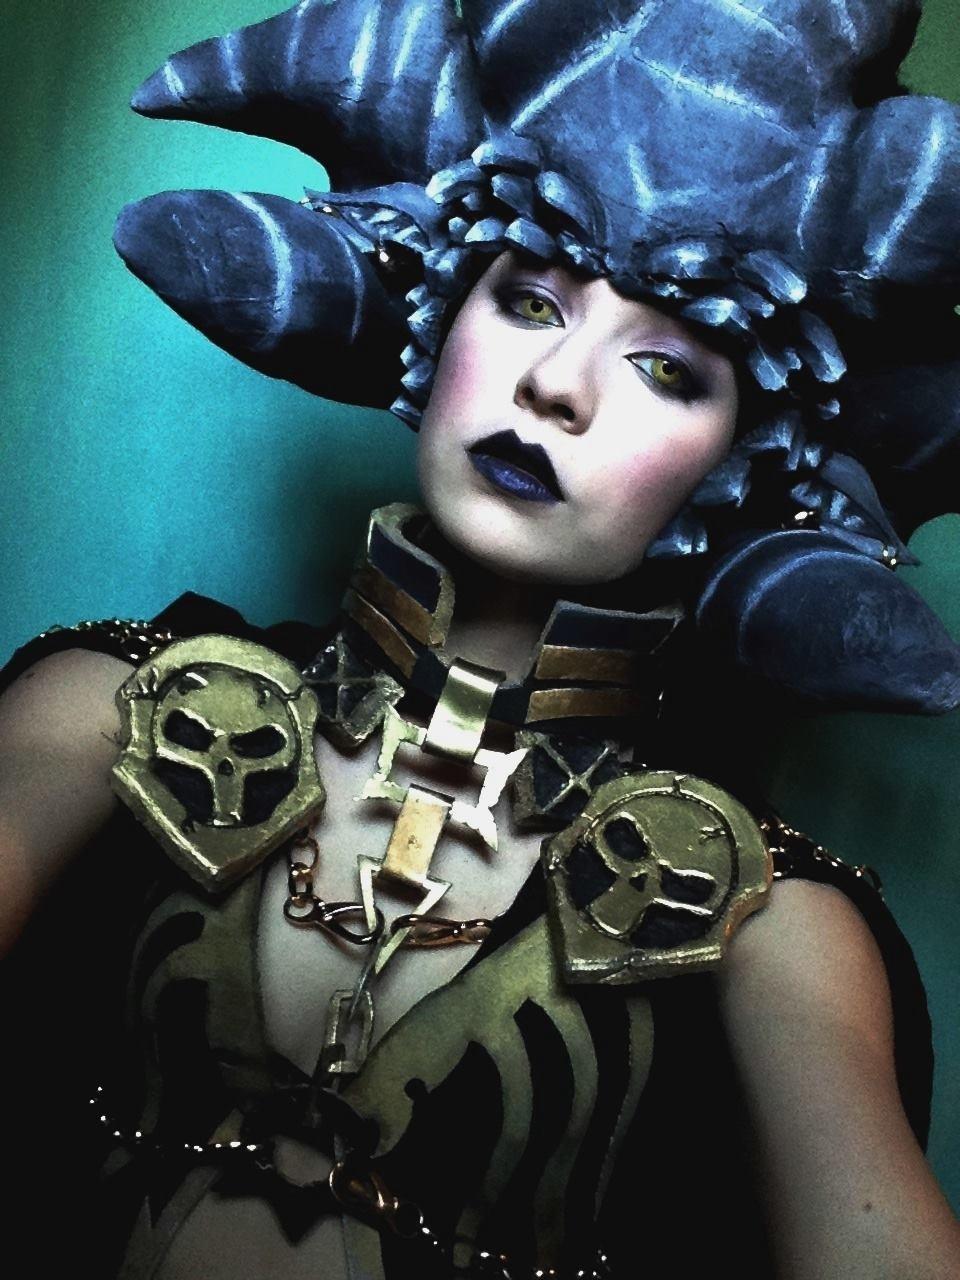 1000  images about Darksiders on Pinterest | Joe madureira, Ruins ...